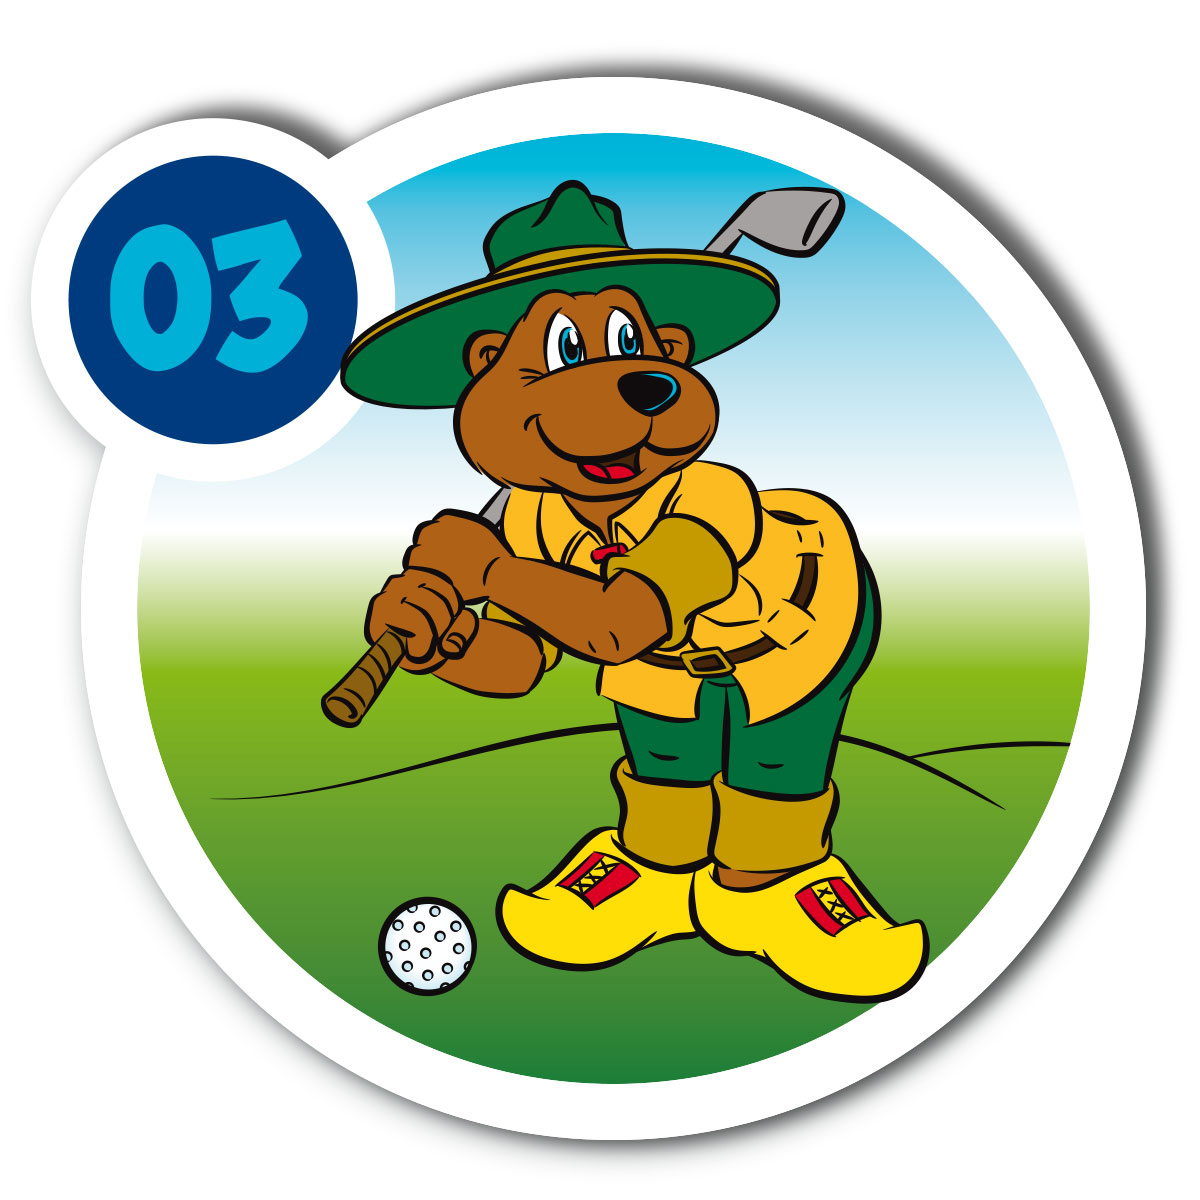 Ontwerp en illustratie bordjes midgetgolf - Landal GreenParks - Bollo - detail-1